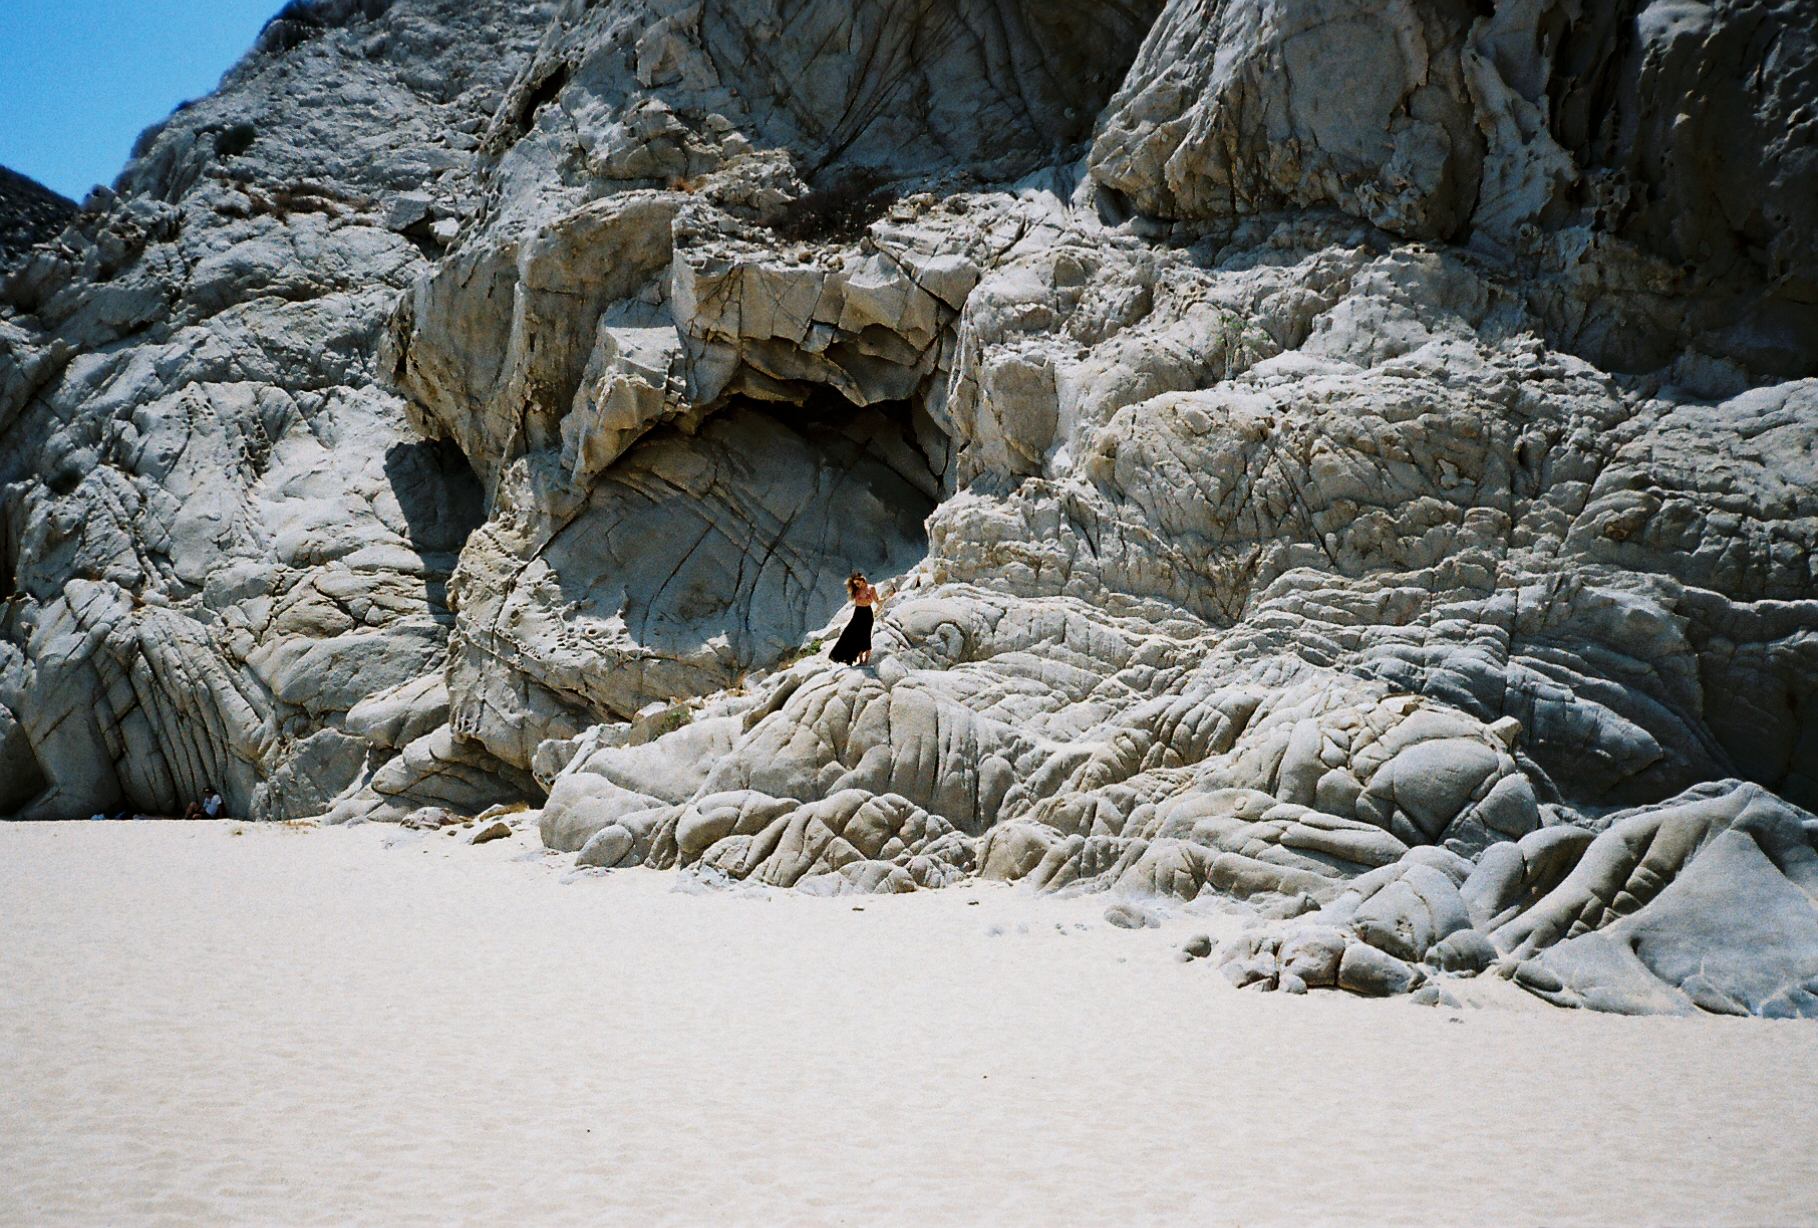 Lover's Beach, Mexico (35mm)